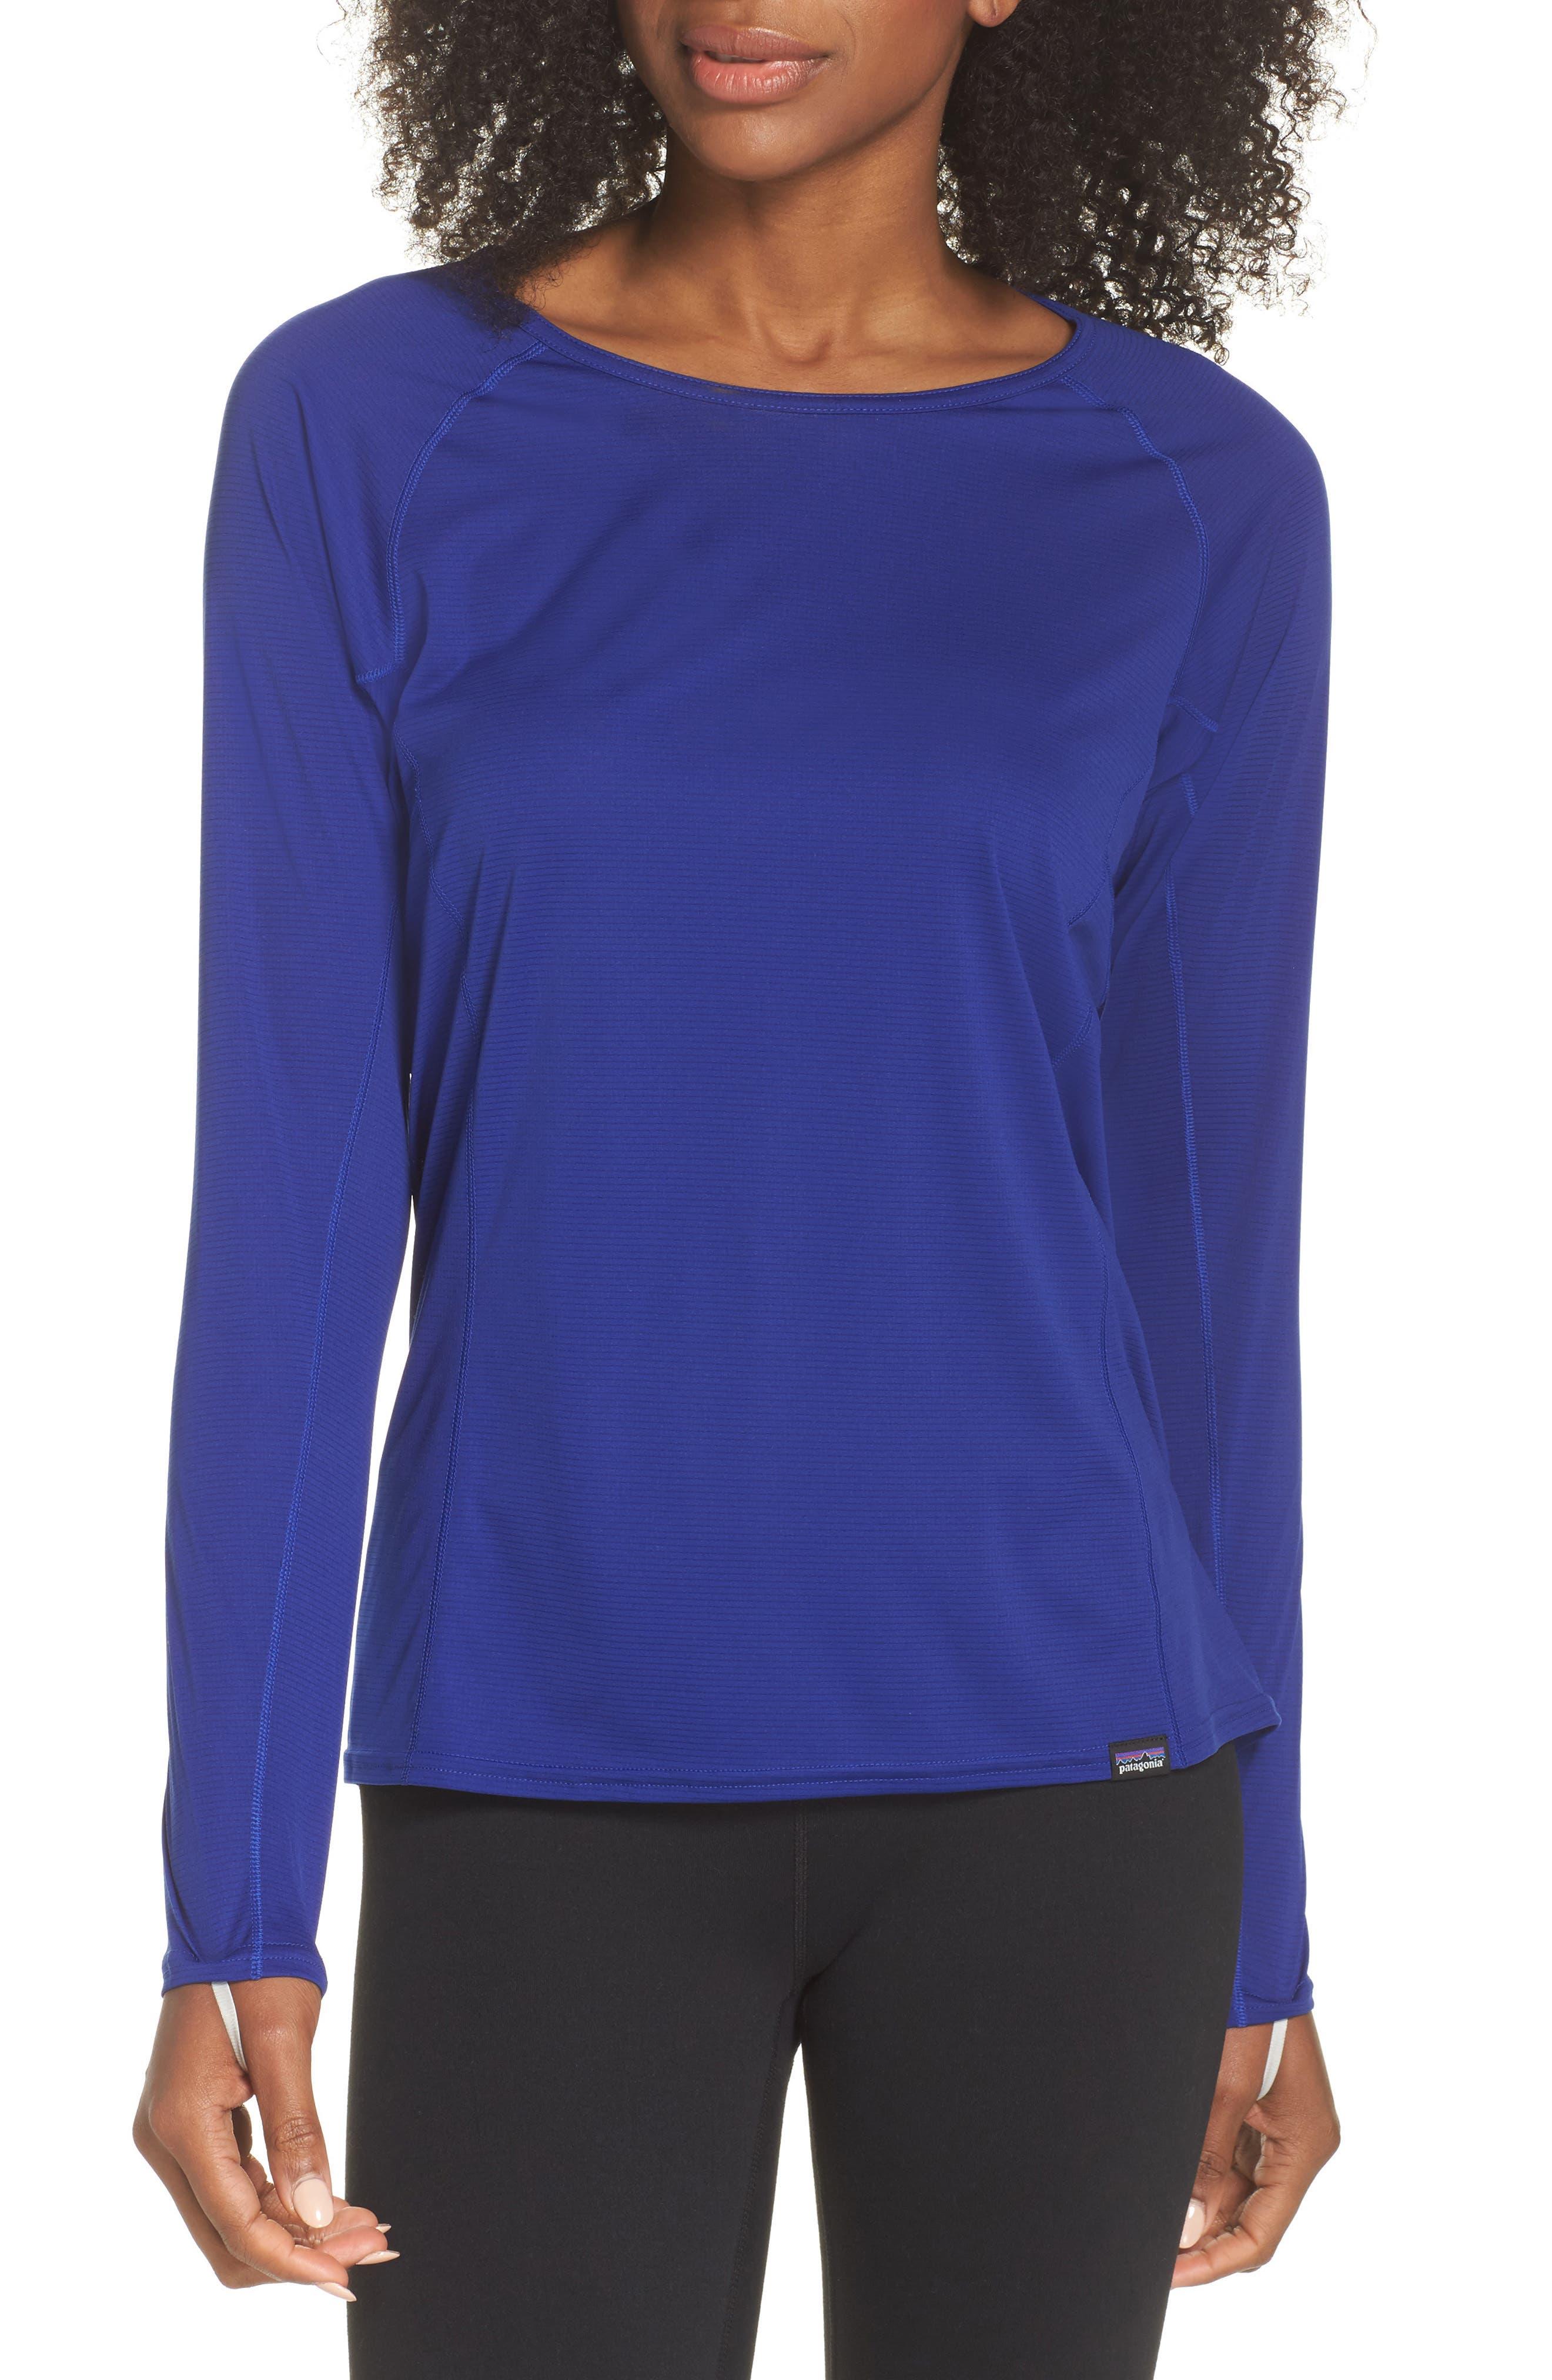 Lightweight Capilene<sup>®</sup> Long-Sleeve Tee,                             Main thumbnail 1, color,                             Cobalt Blue